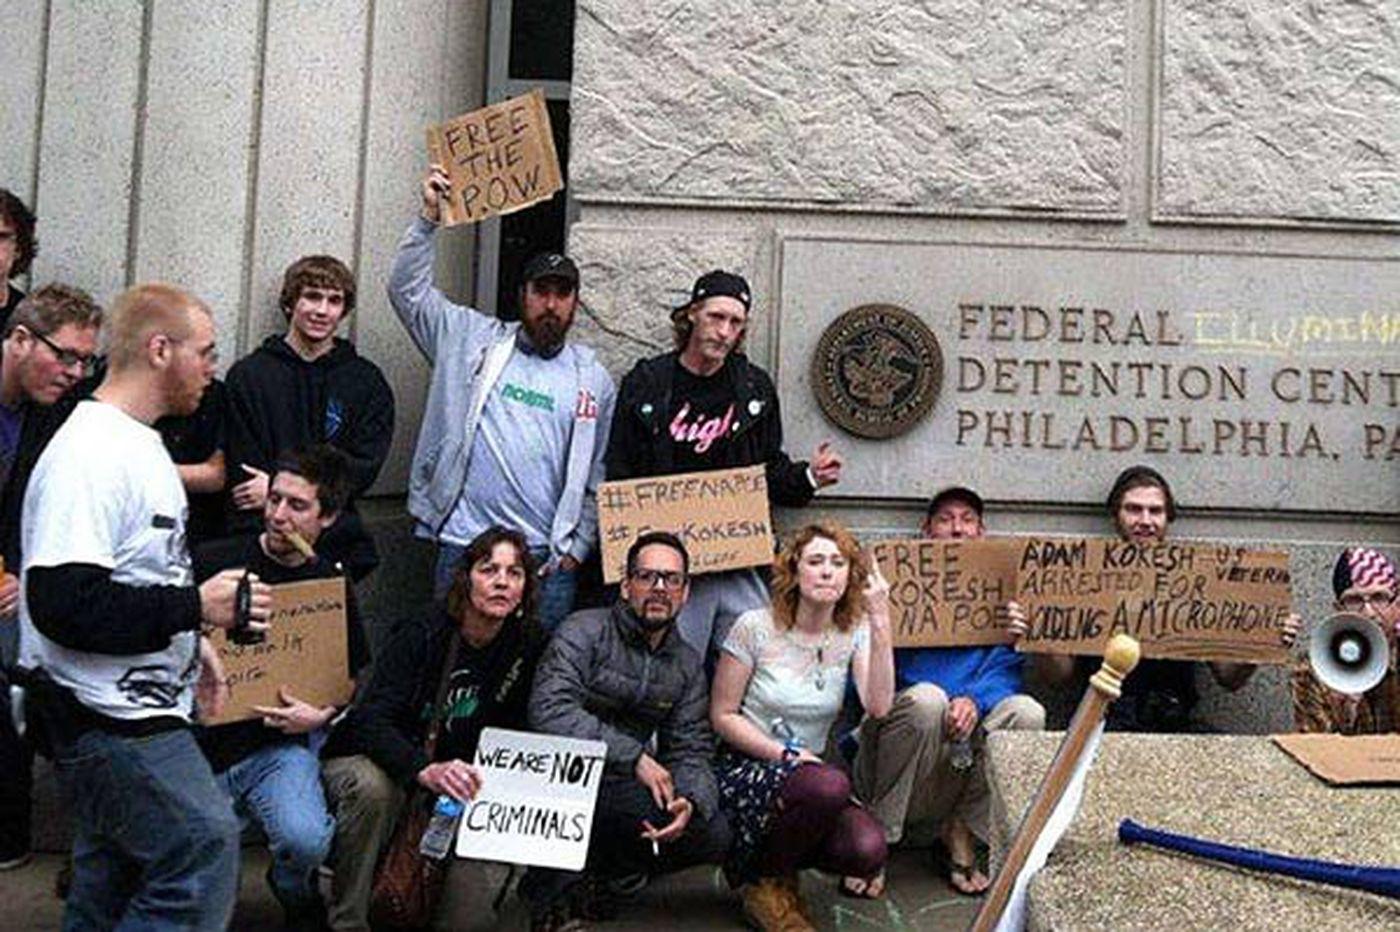 Pot activists reportedly arrested